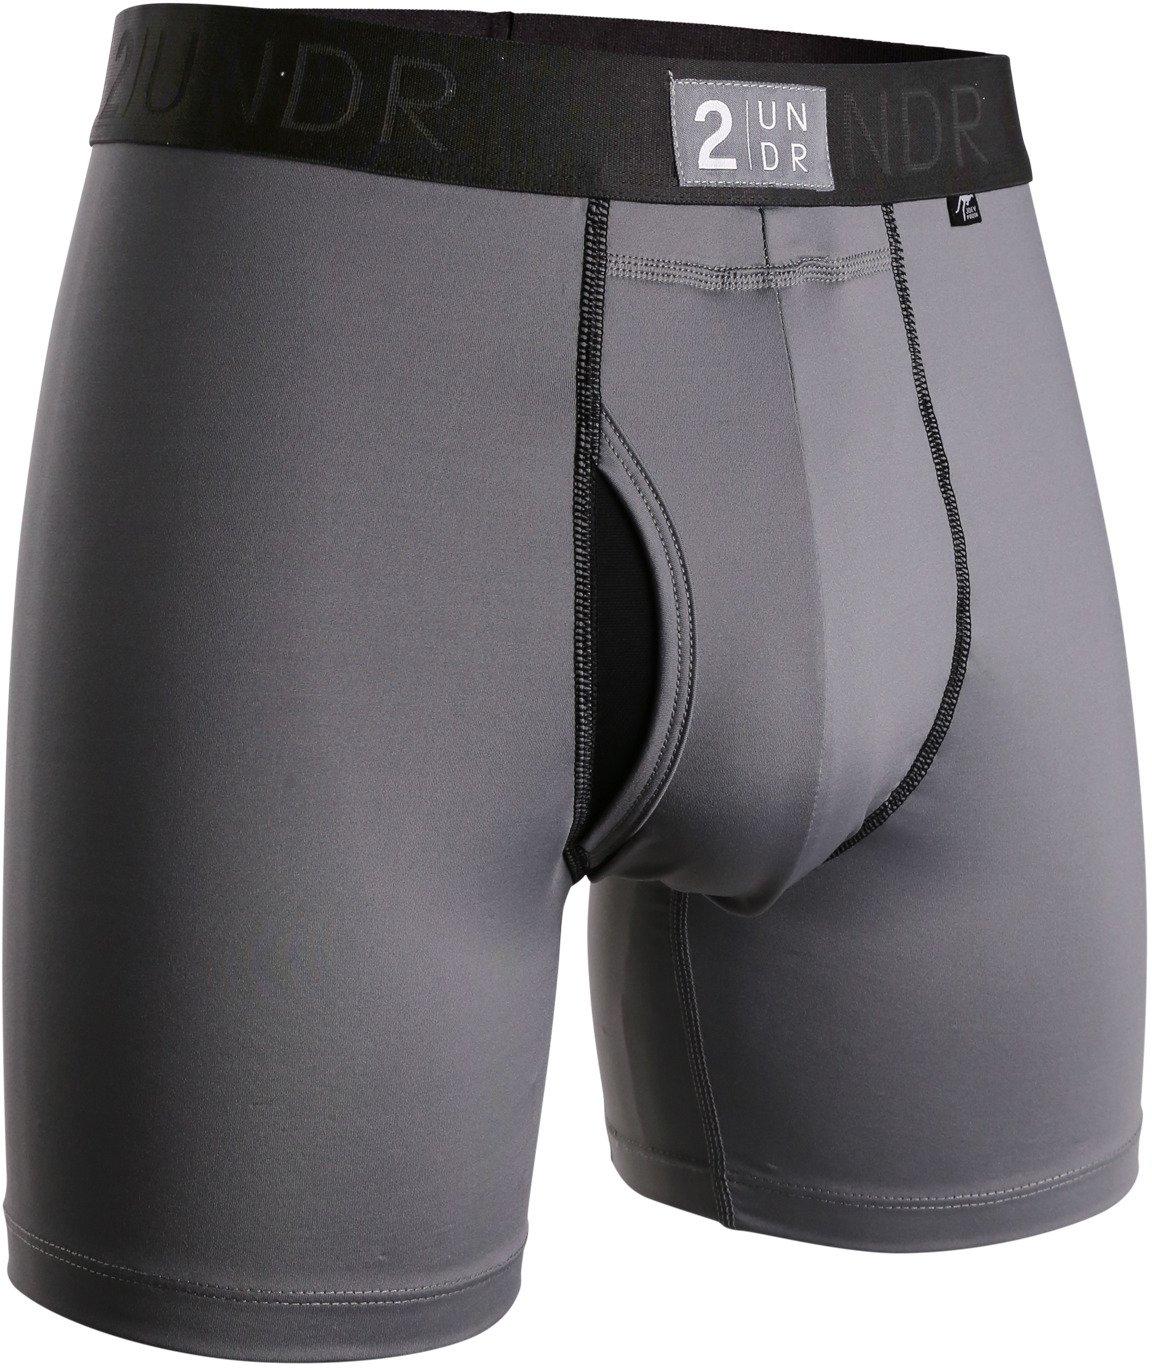 2UNDR Men's Power Shift 6 in Boxer Briefs